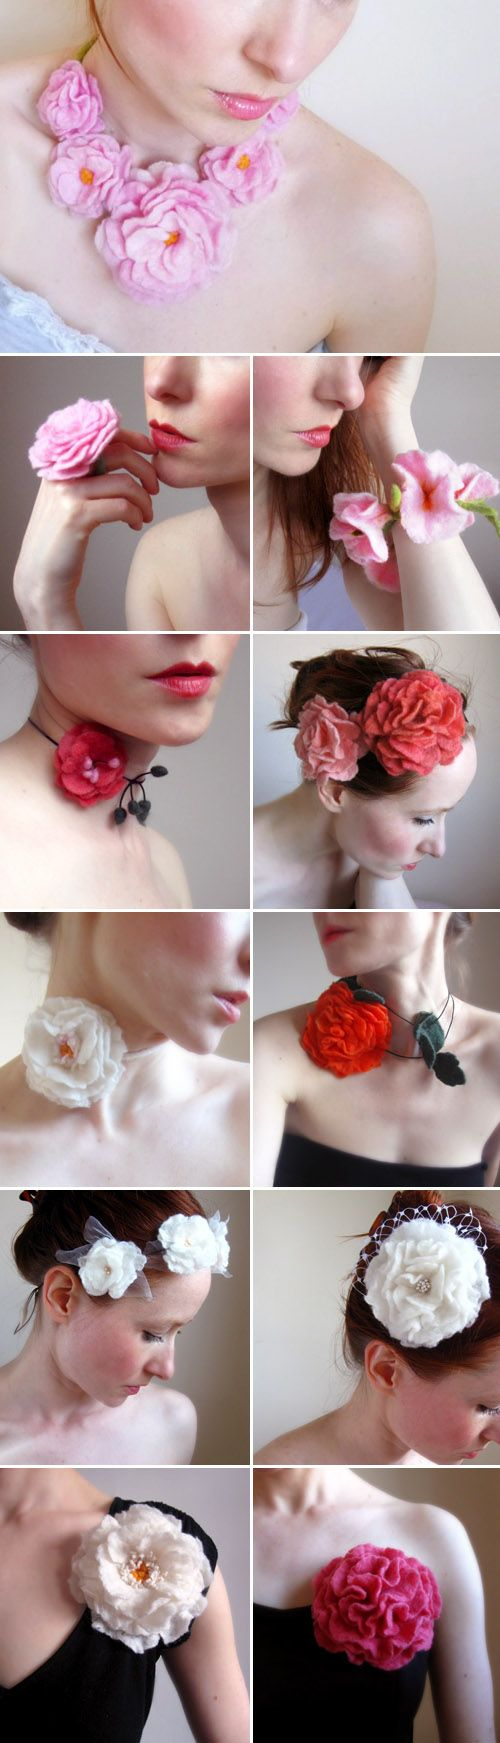 Felt flower accessories